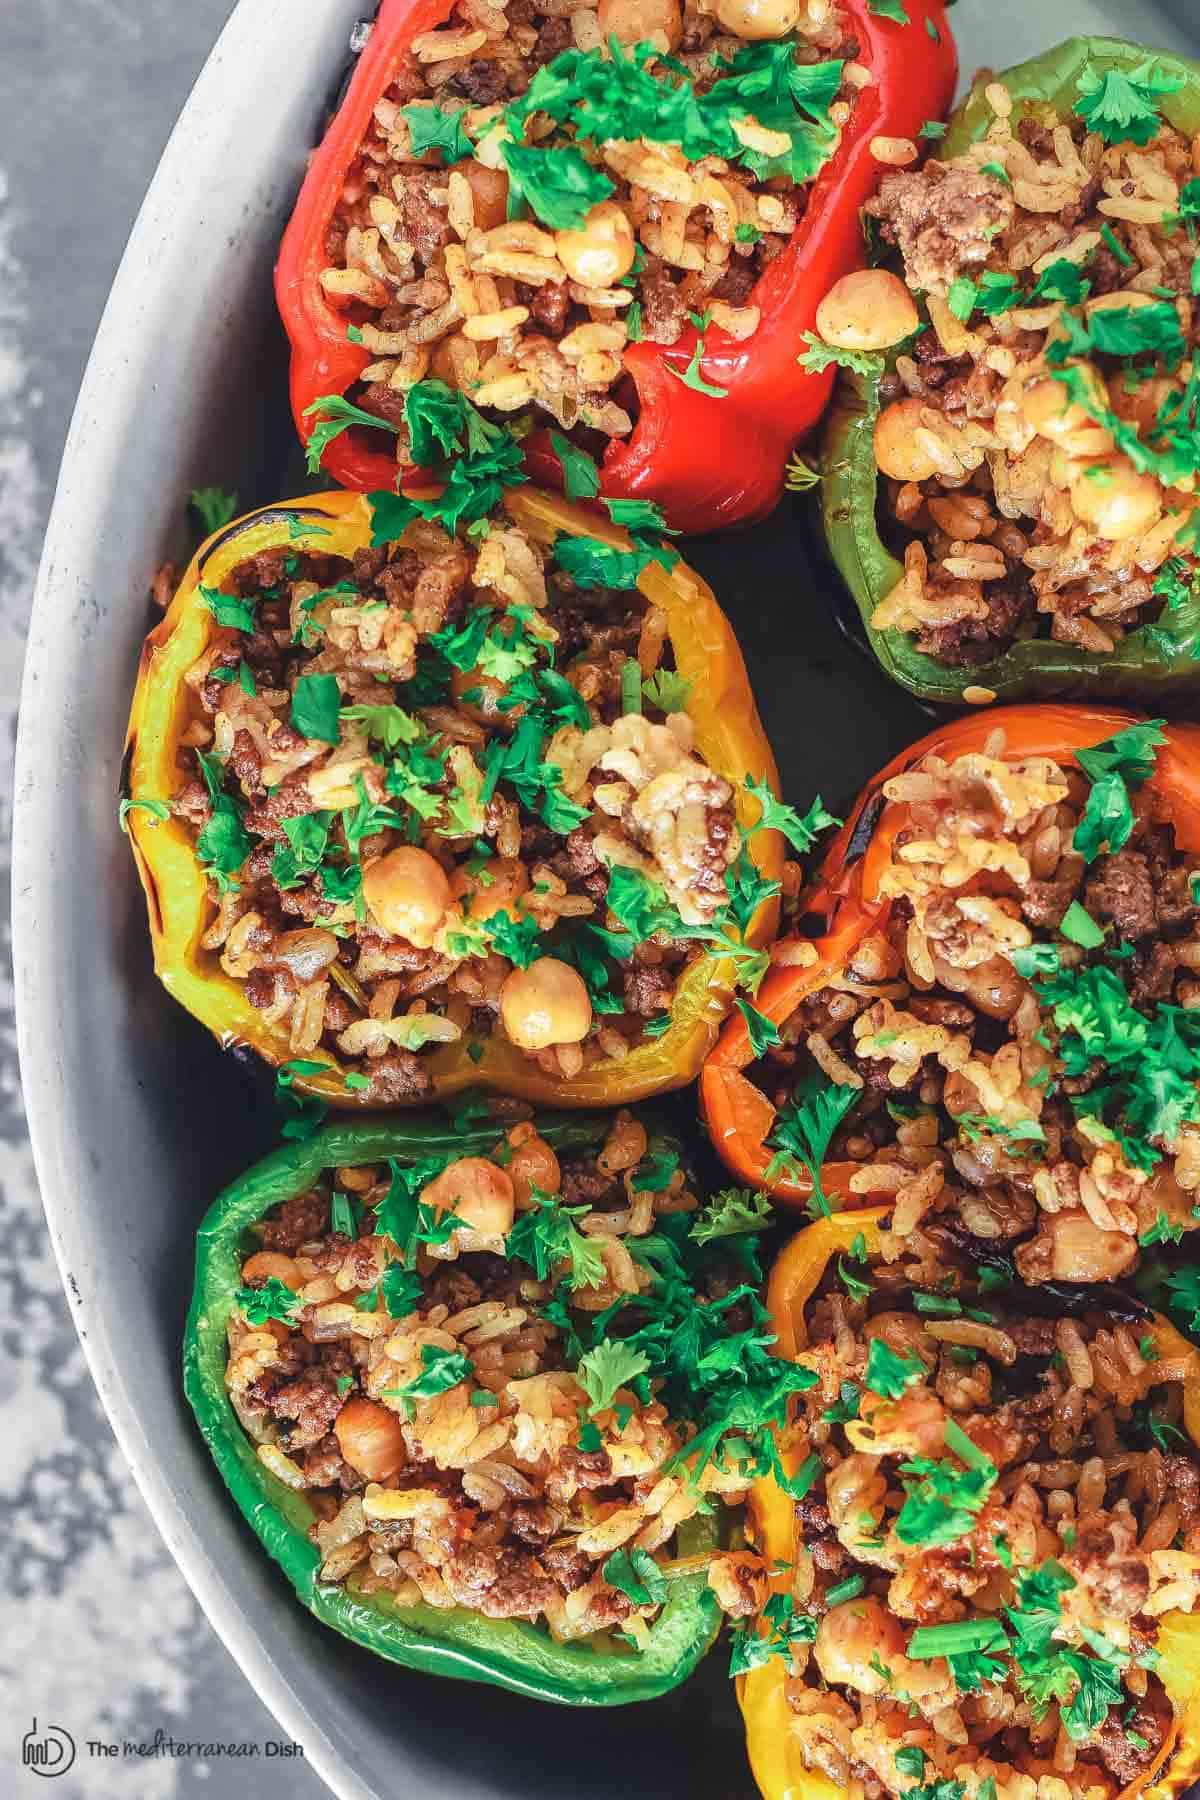 Greek Stuffed Peppers Dairy And Gluten Free The Mediterranean Dish,Crochet Headband Size Chart